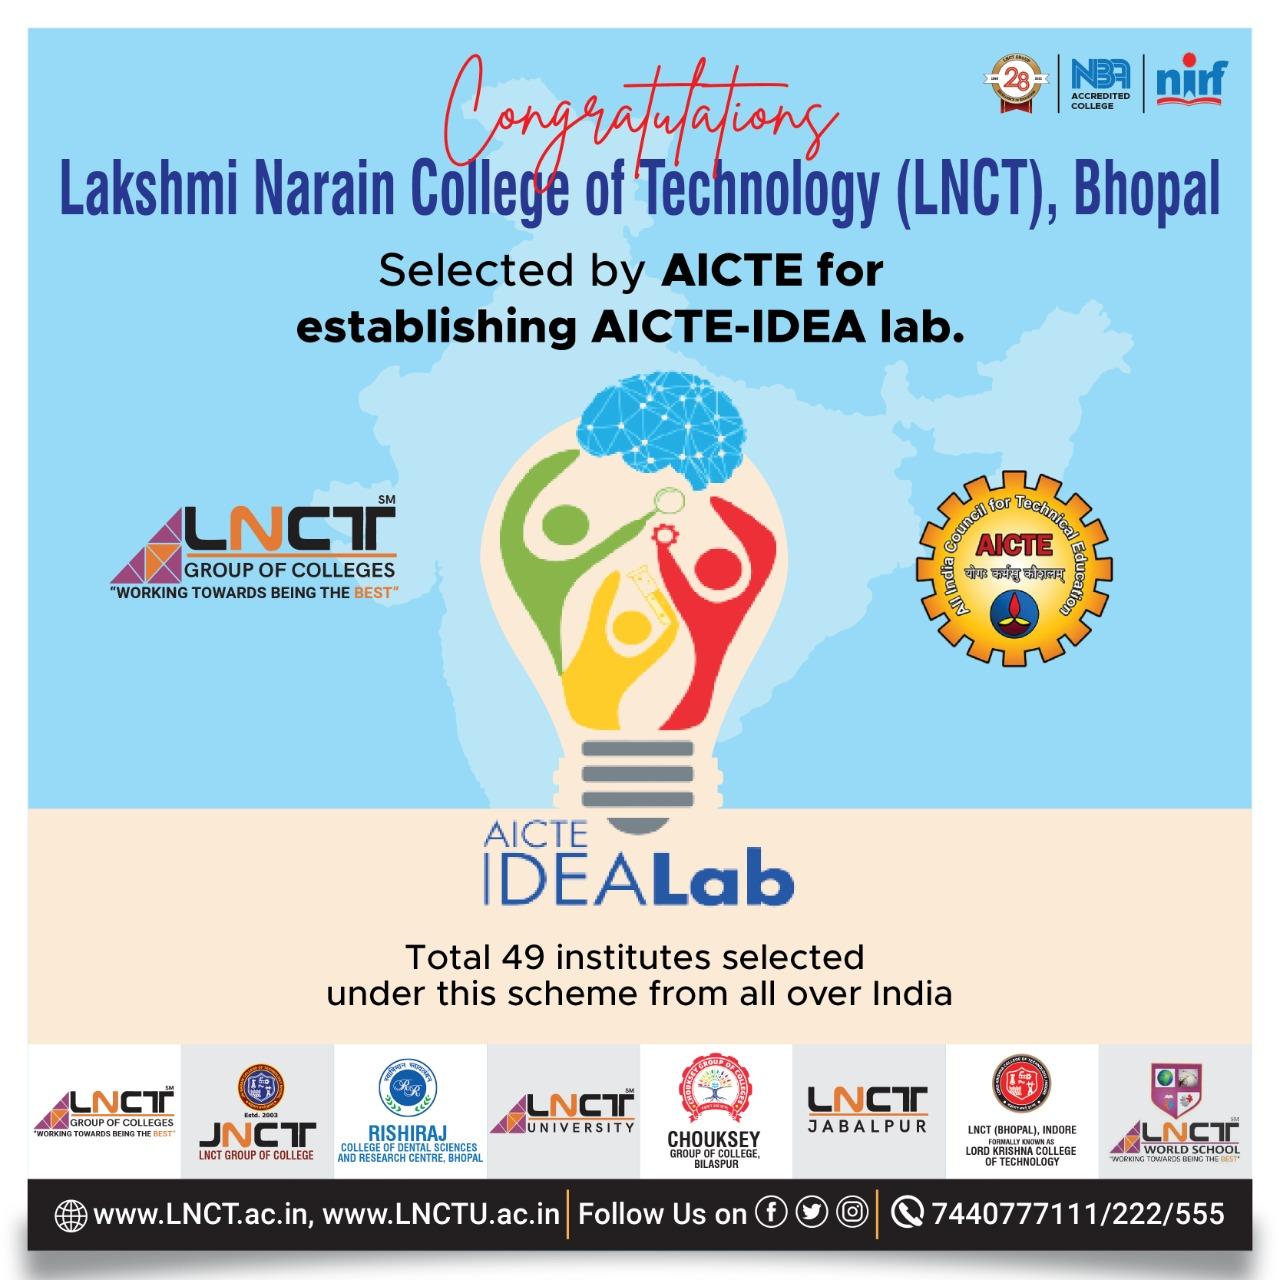 LNCT, Bhopal Selected by AICTE For establishing AICTE - IDEA Lab 4